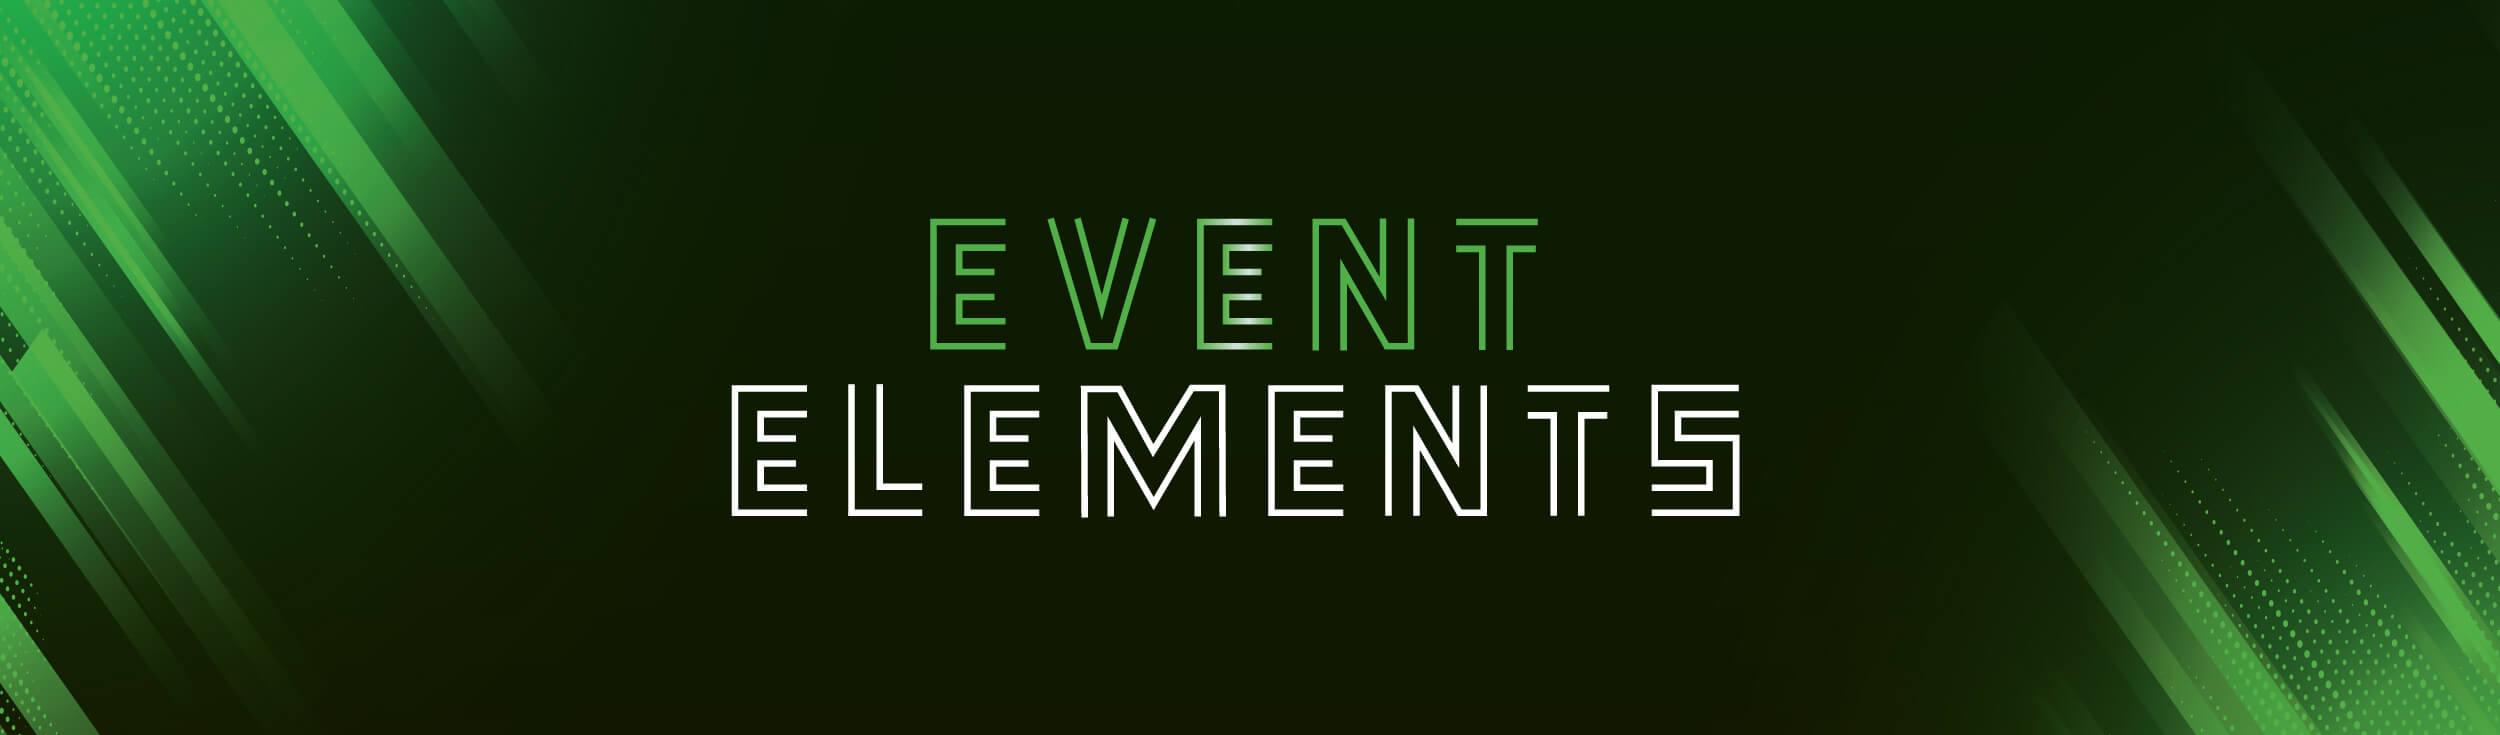 Event Elements